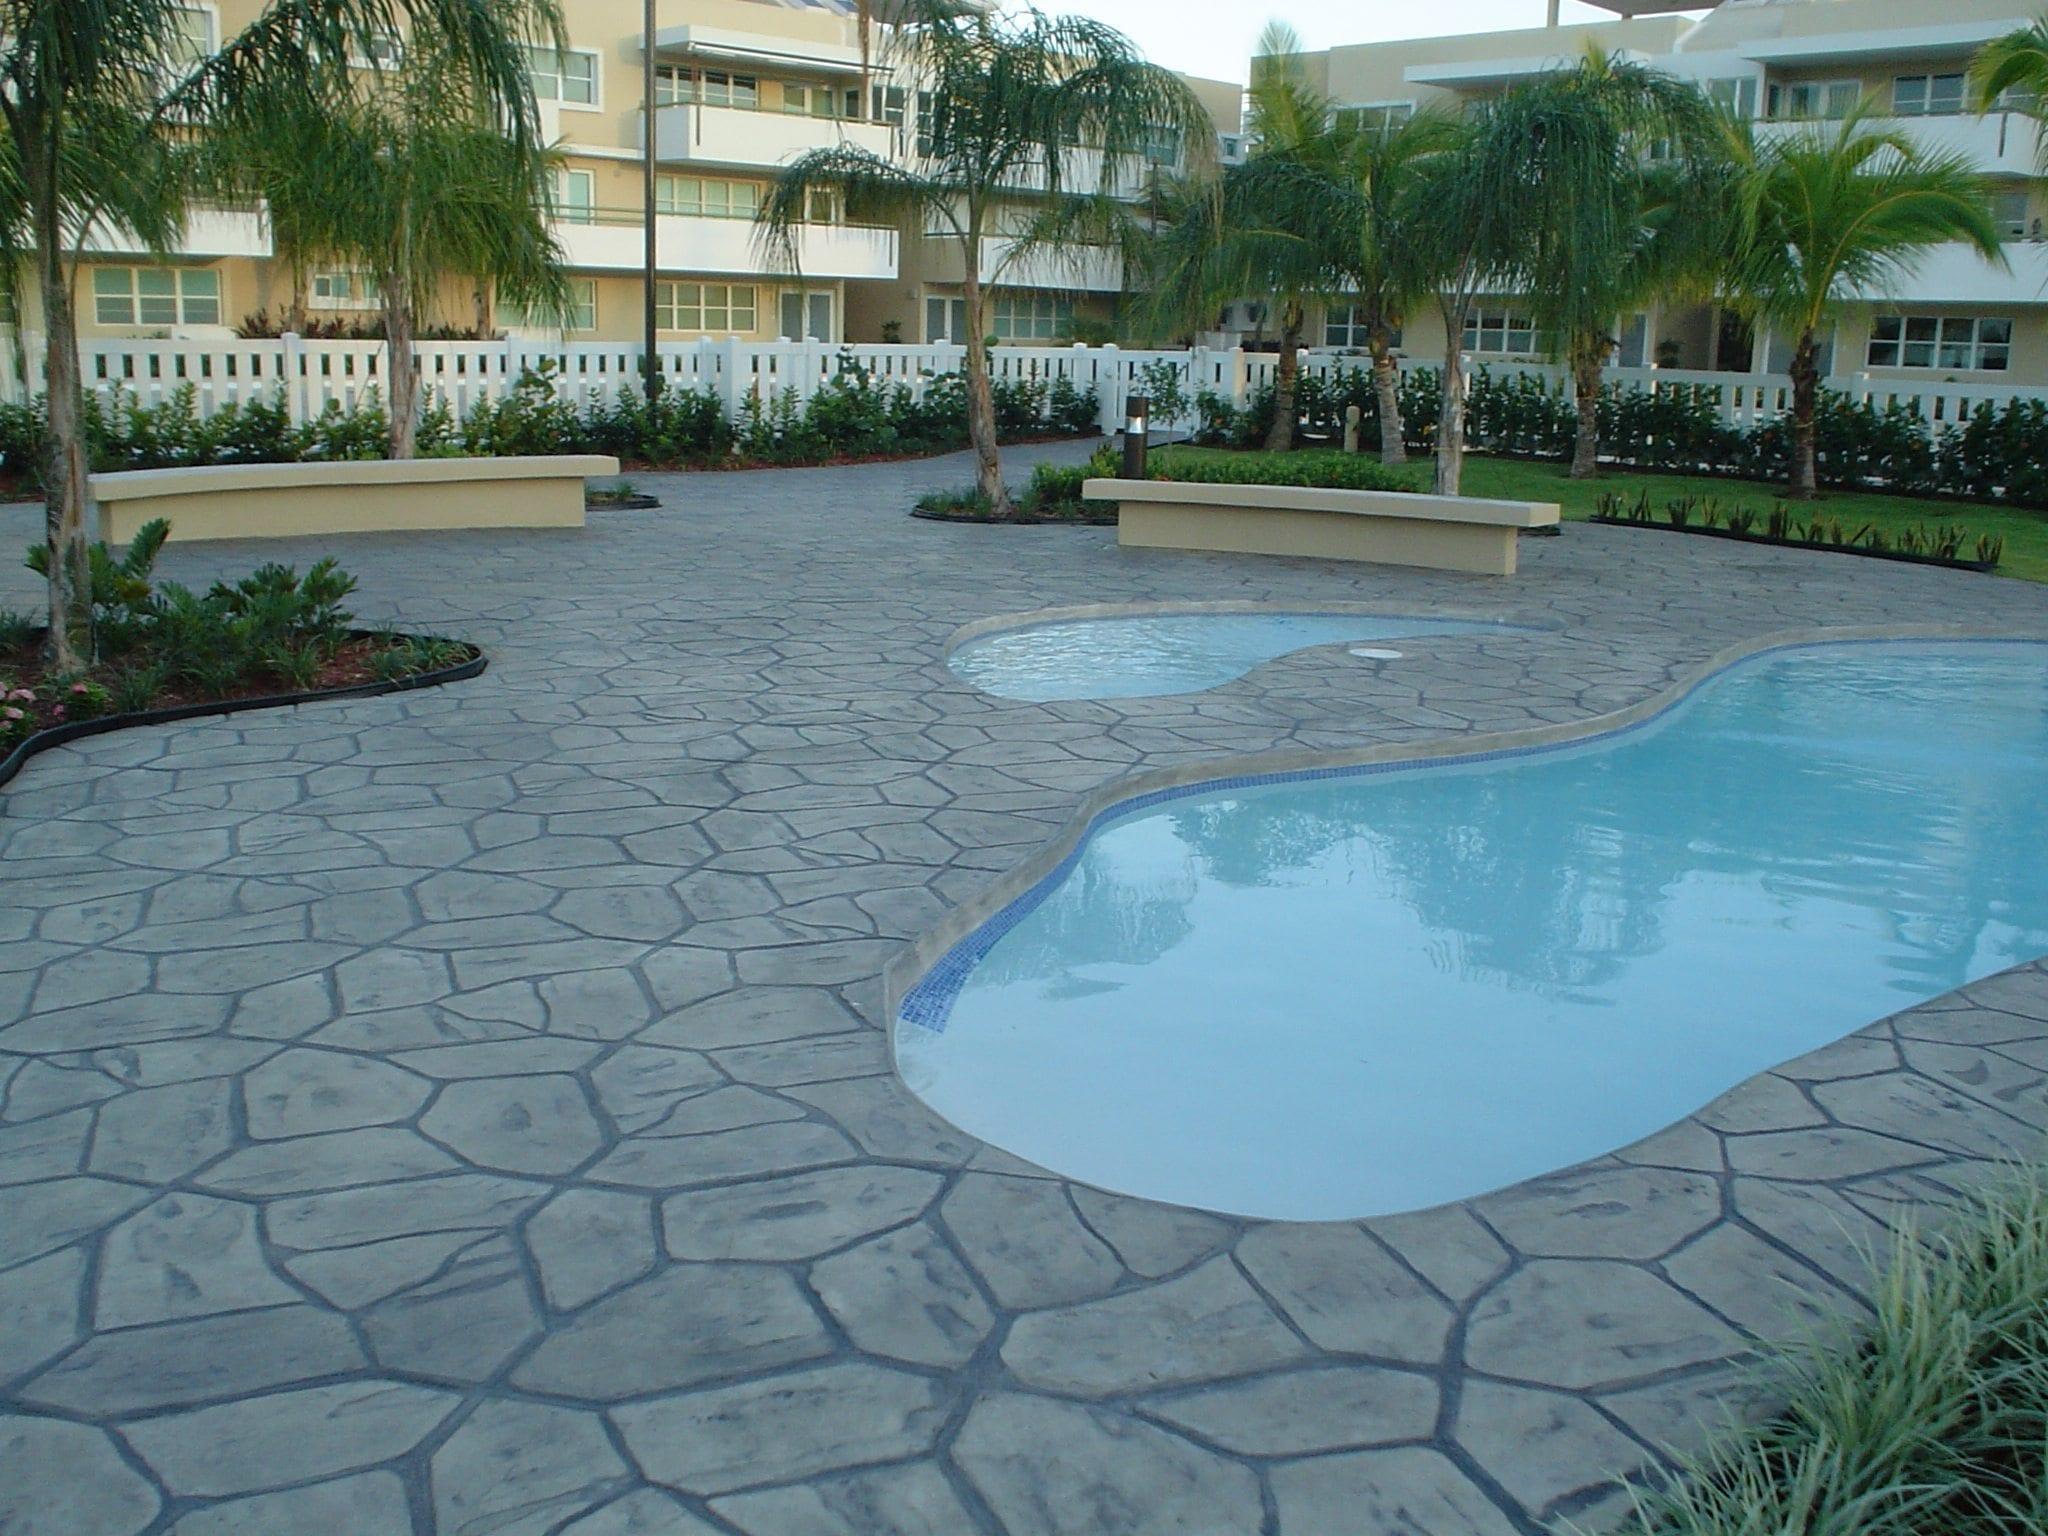 Decorative Concrete Pool Restoration Products